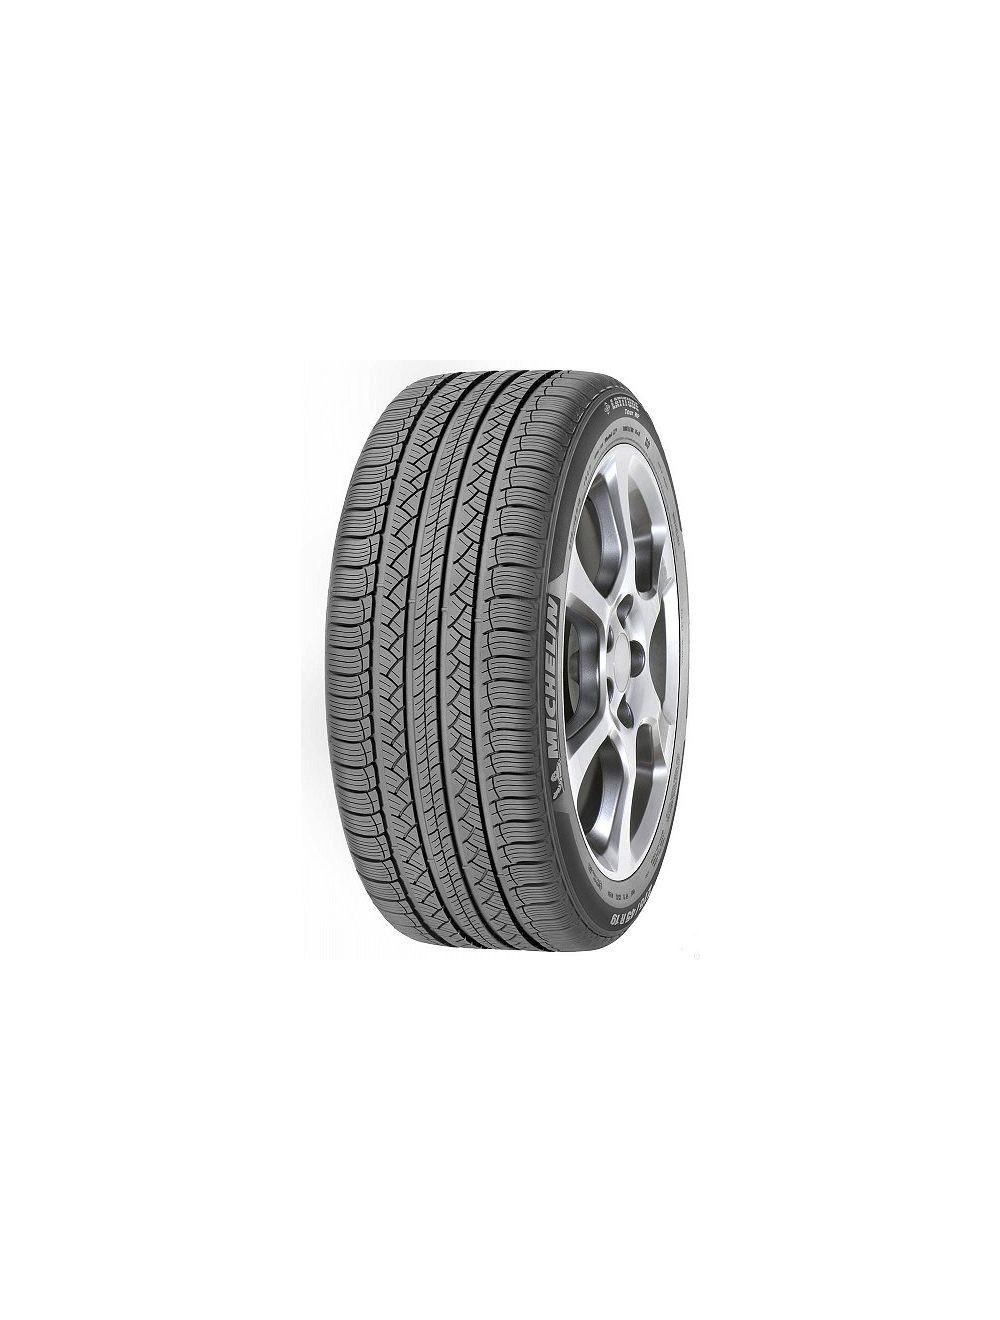 Michelin 265/60R18 V Latitude Tour HP MO DOT18 Nyári gumi